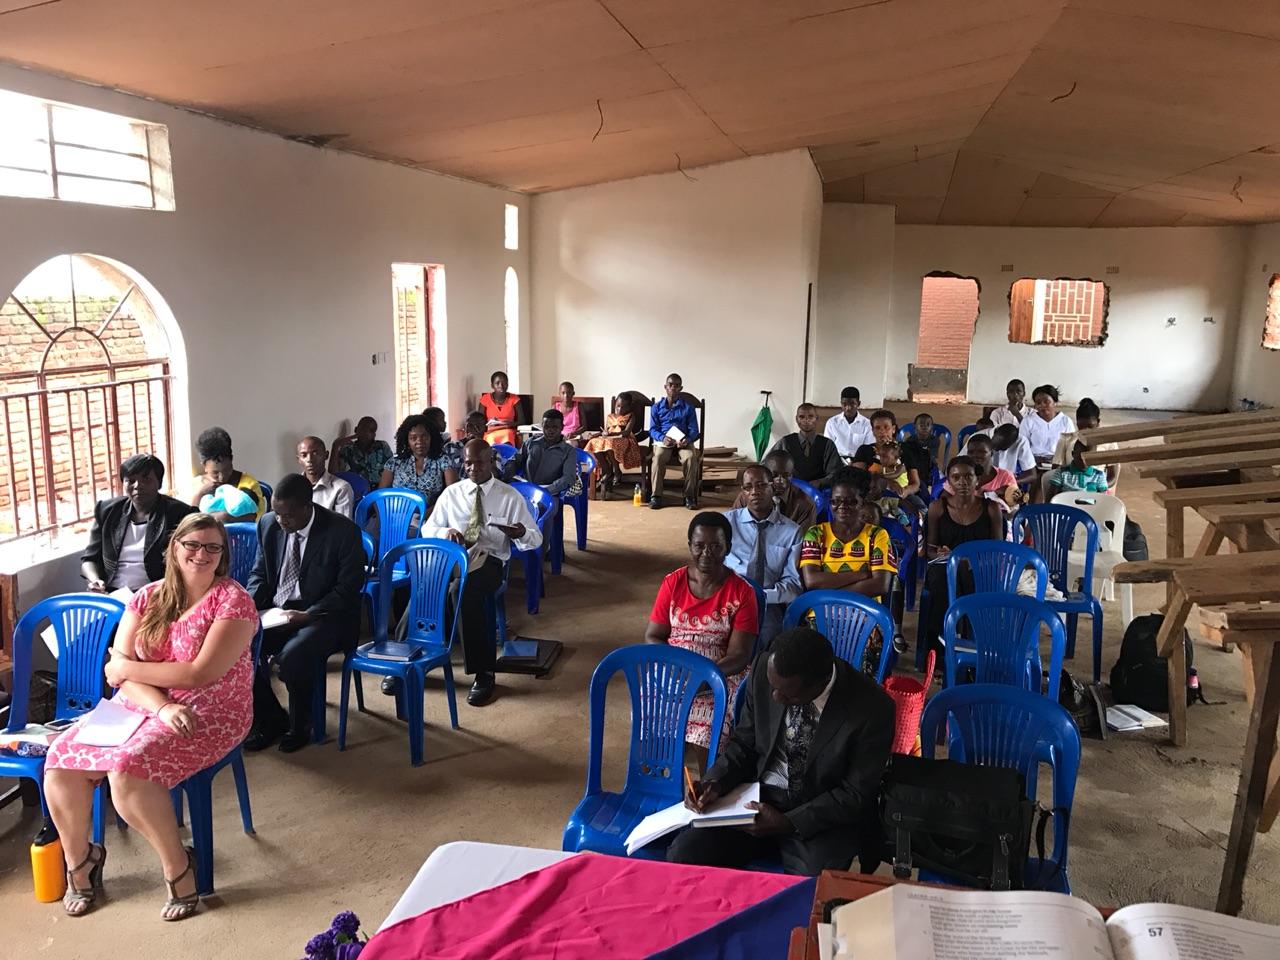 Congregation in Lilongwe - 11 February 2017